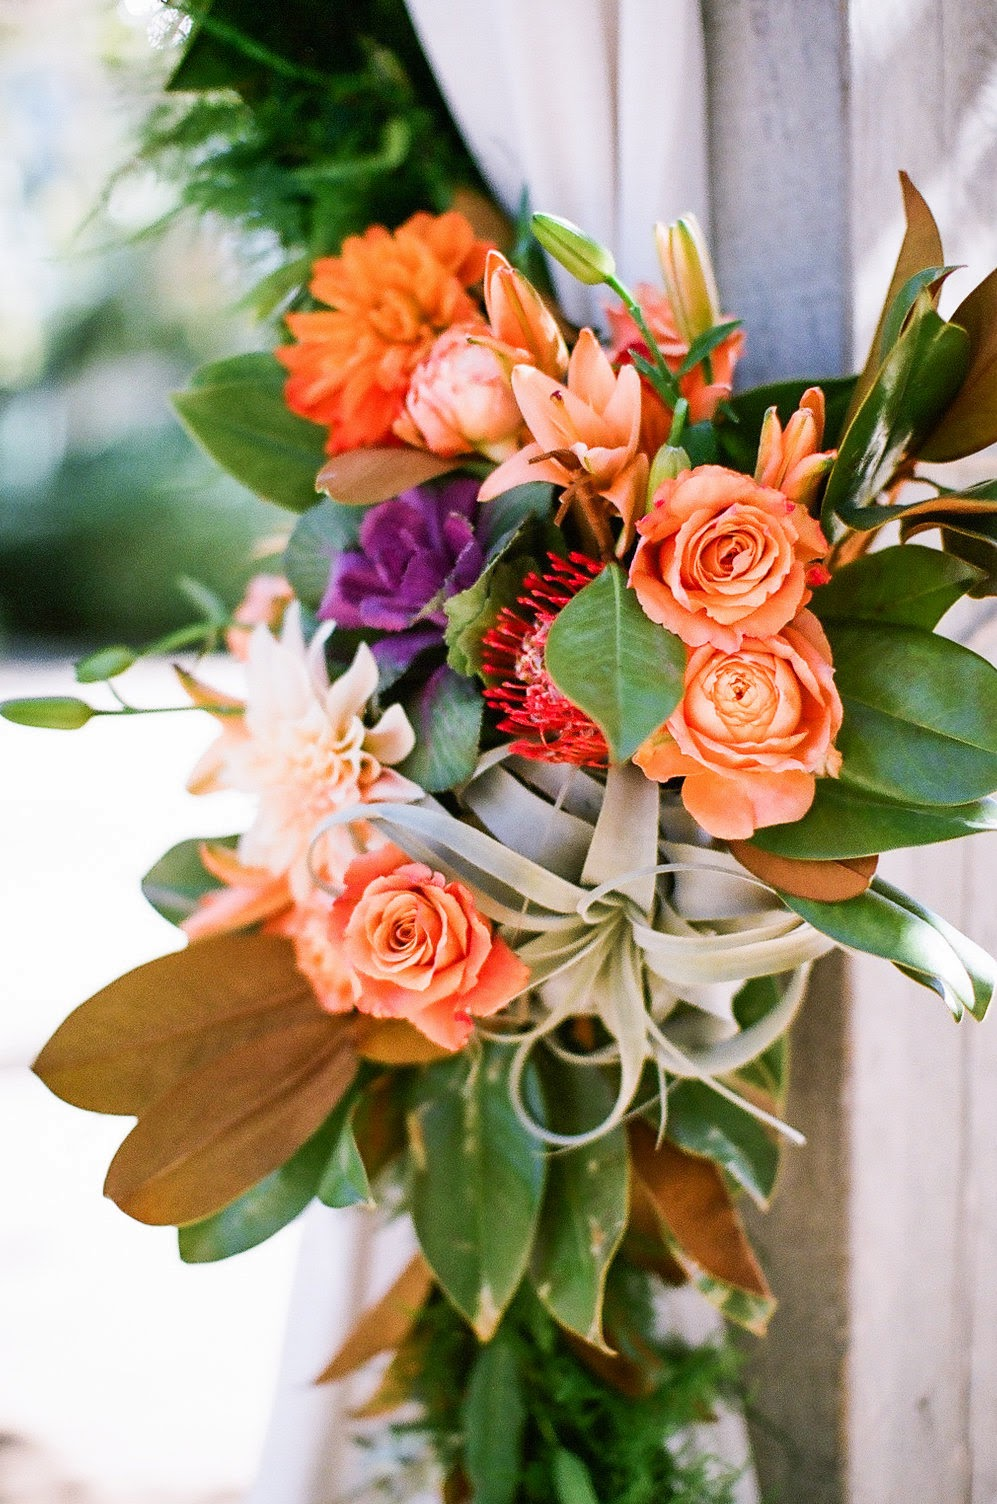 santabarbarawedding.com | photography: Nancy Neil | Orange Eclectic Wedding Ideas